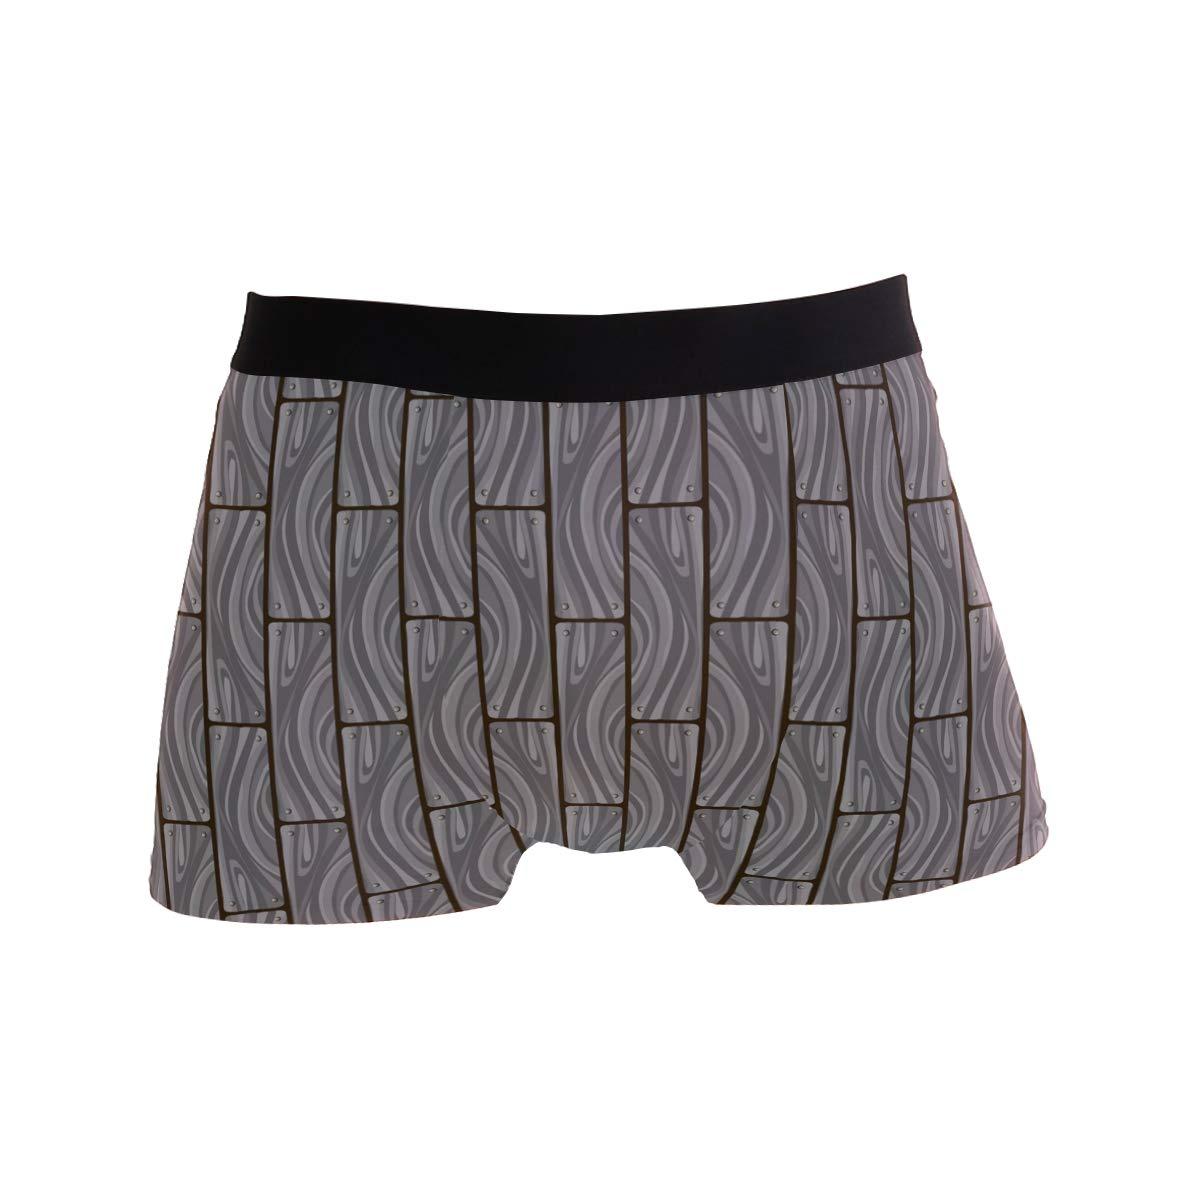 Jereee Abstract Gray Hardwood Planks Pattern Mens Underwear Soft Polyester Boxer Brief for Men Adult Teen Children Kids S